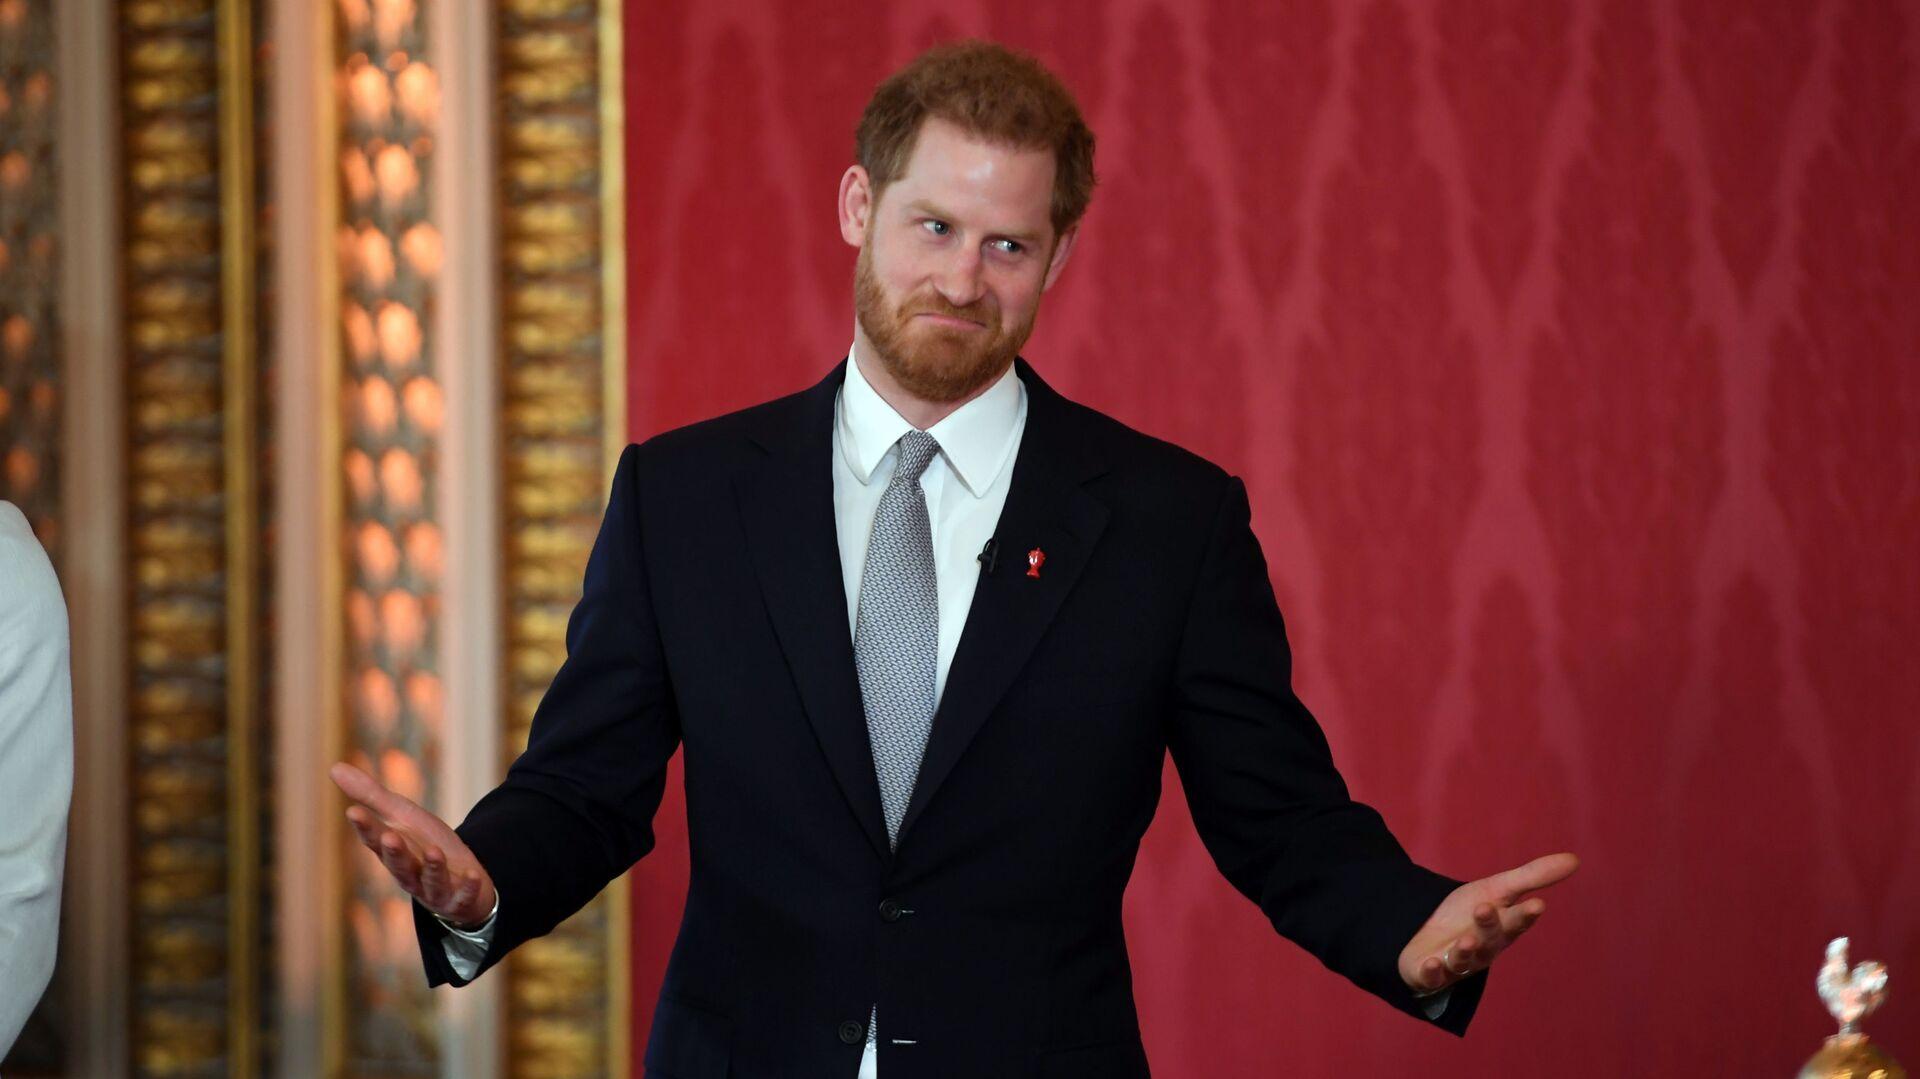 El príncipe Harry, duque de Sussex - Sputnik Mundo, 1920, 12.03.2021